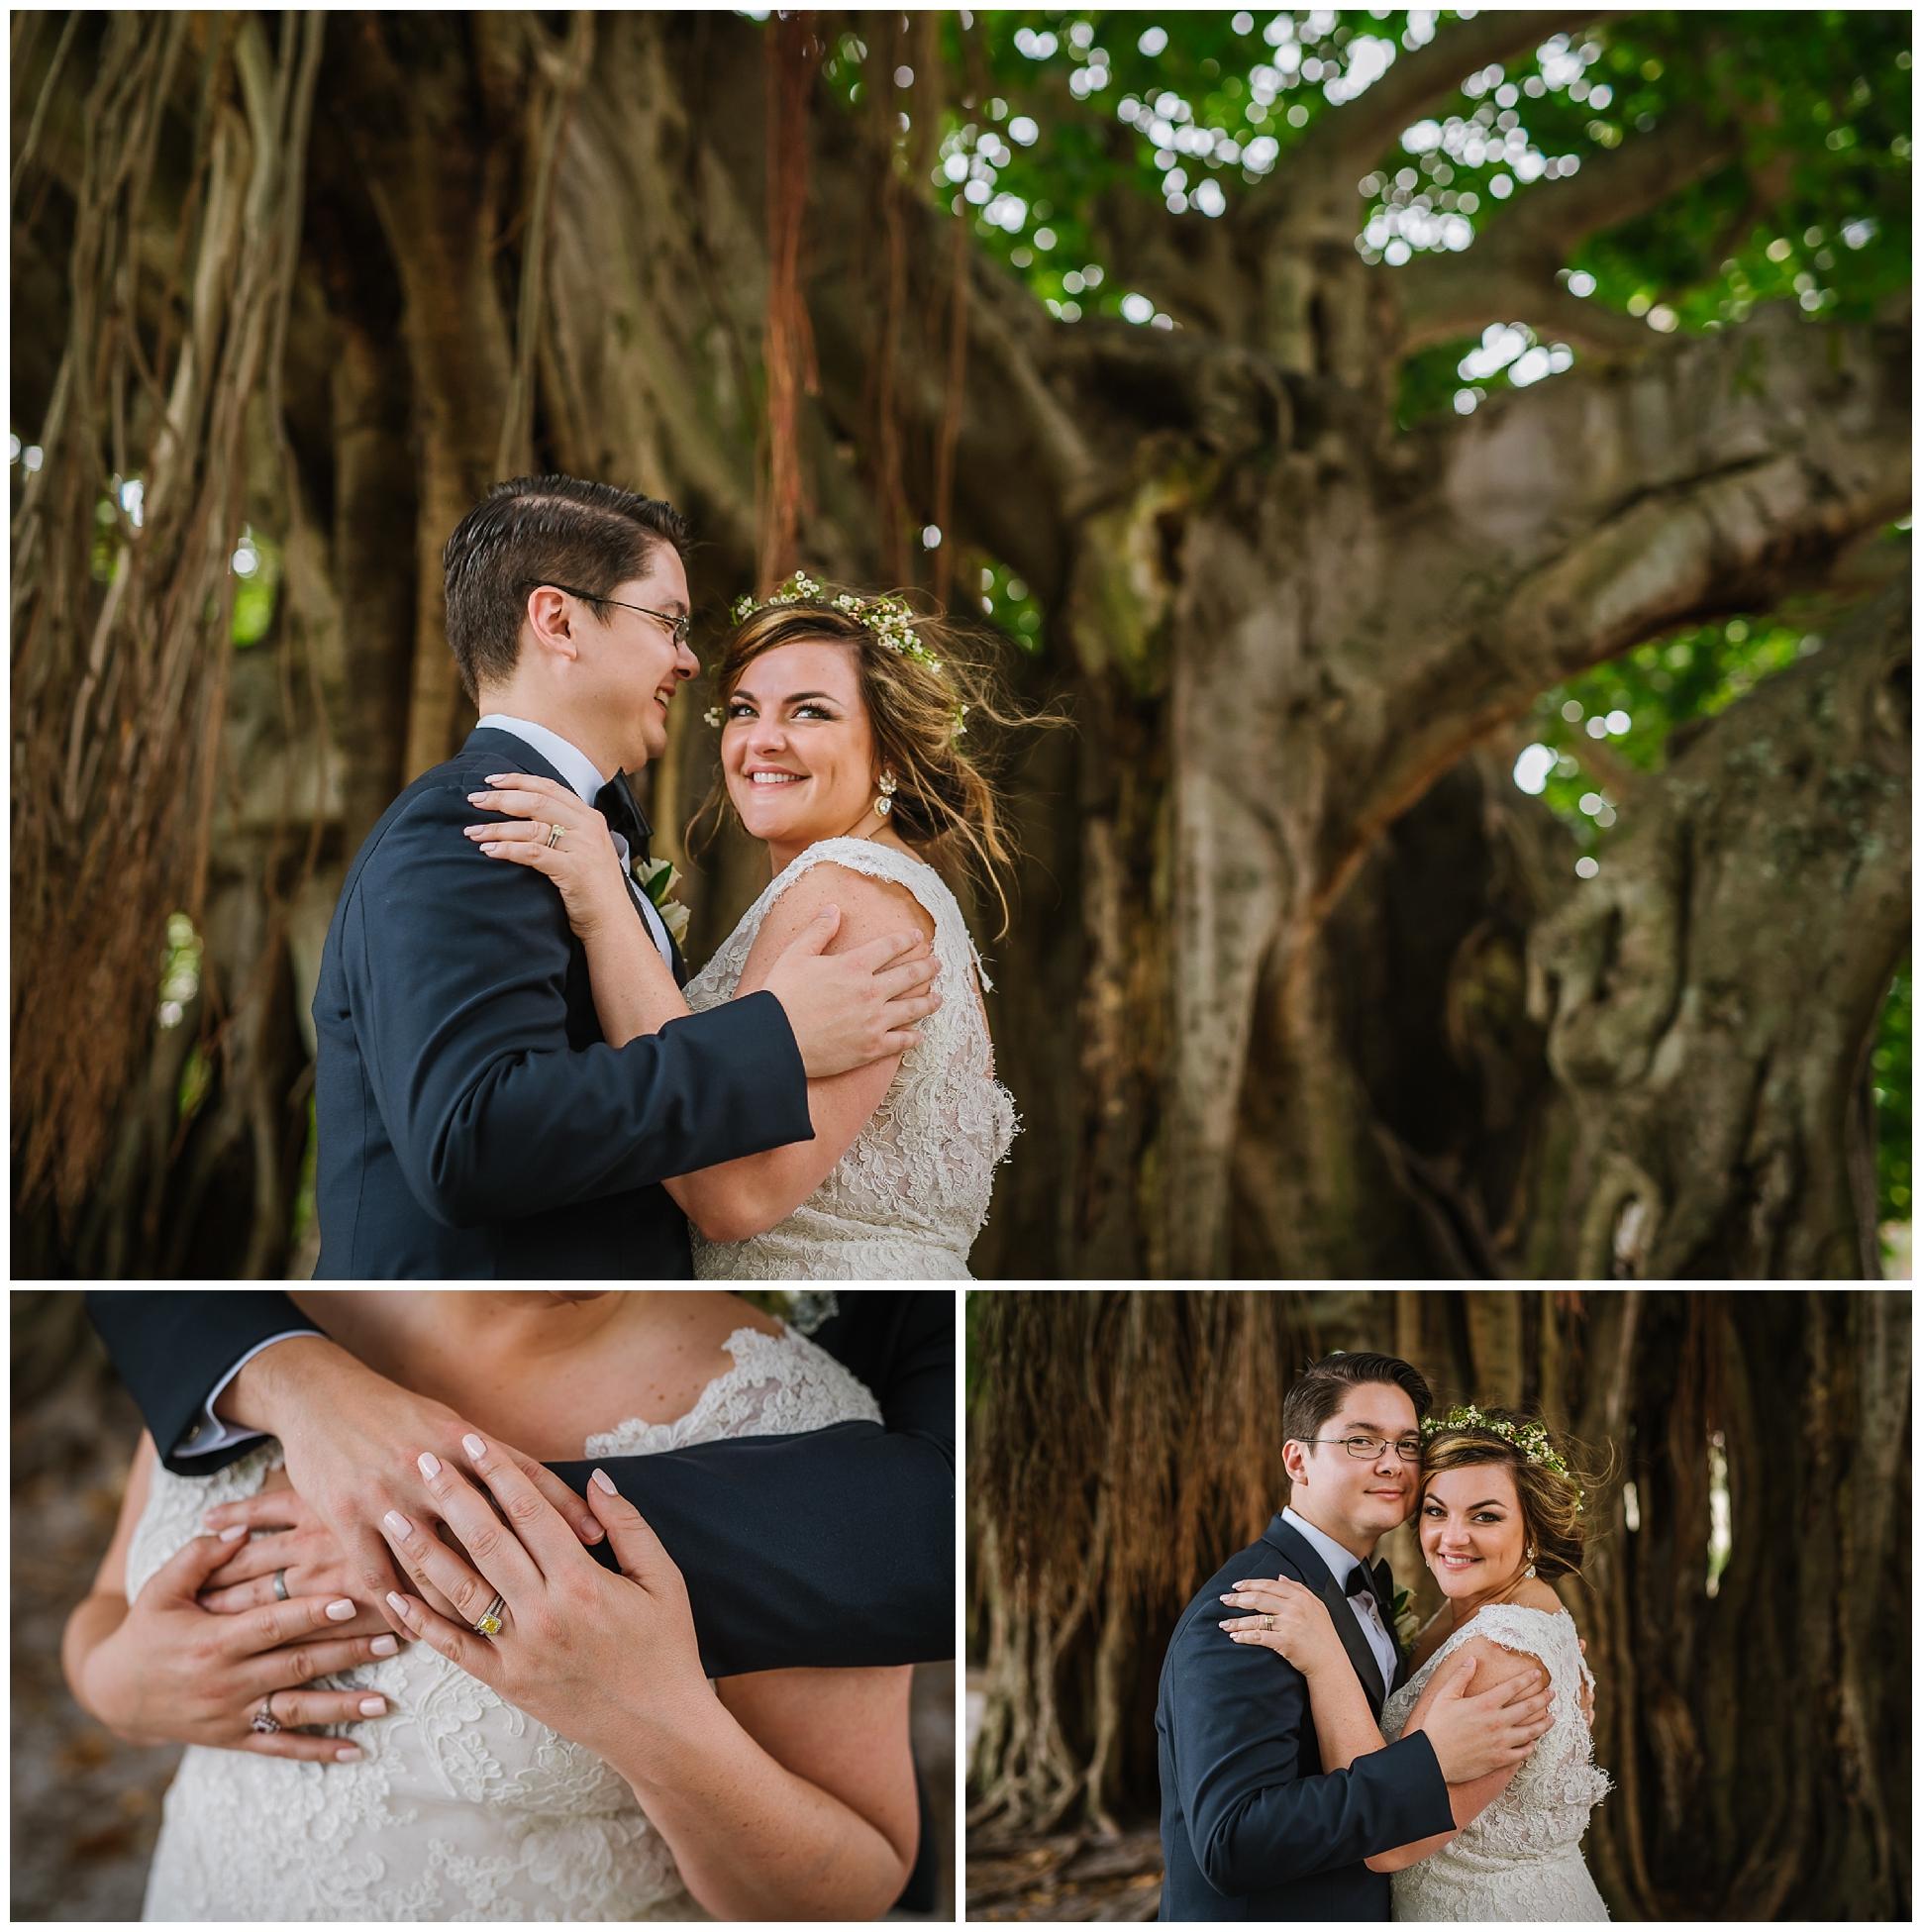 st-pete-wedding-photographer-italian-romance-theme-rustic-flower-crown_0425.jpg